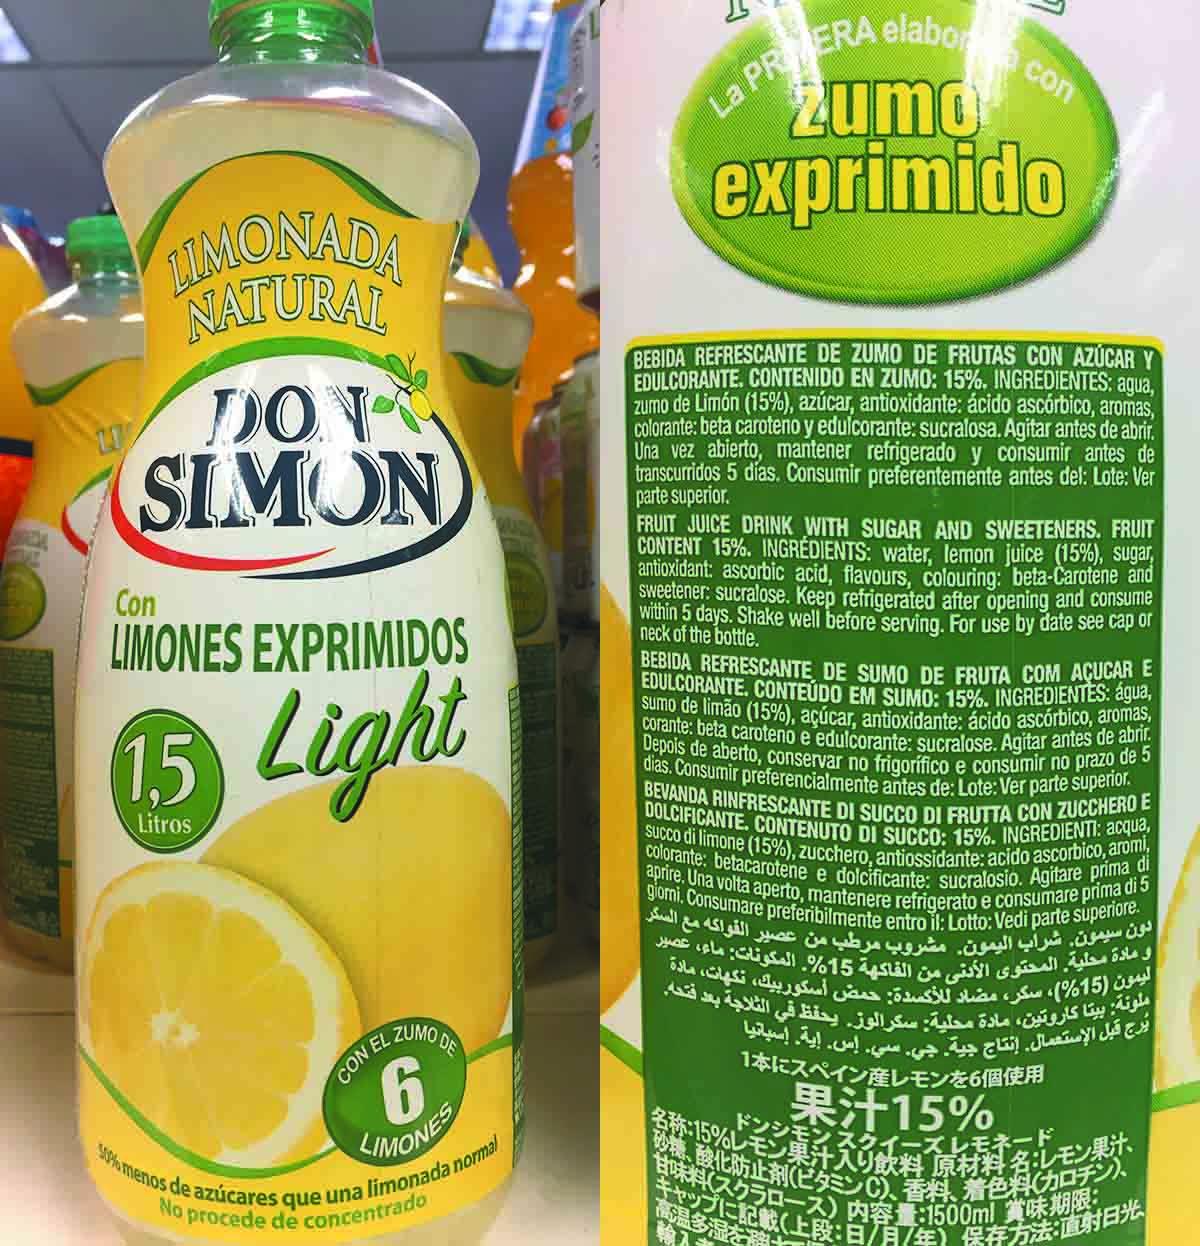 natural zumo de limon